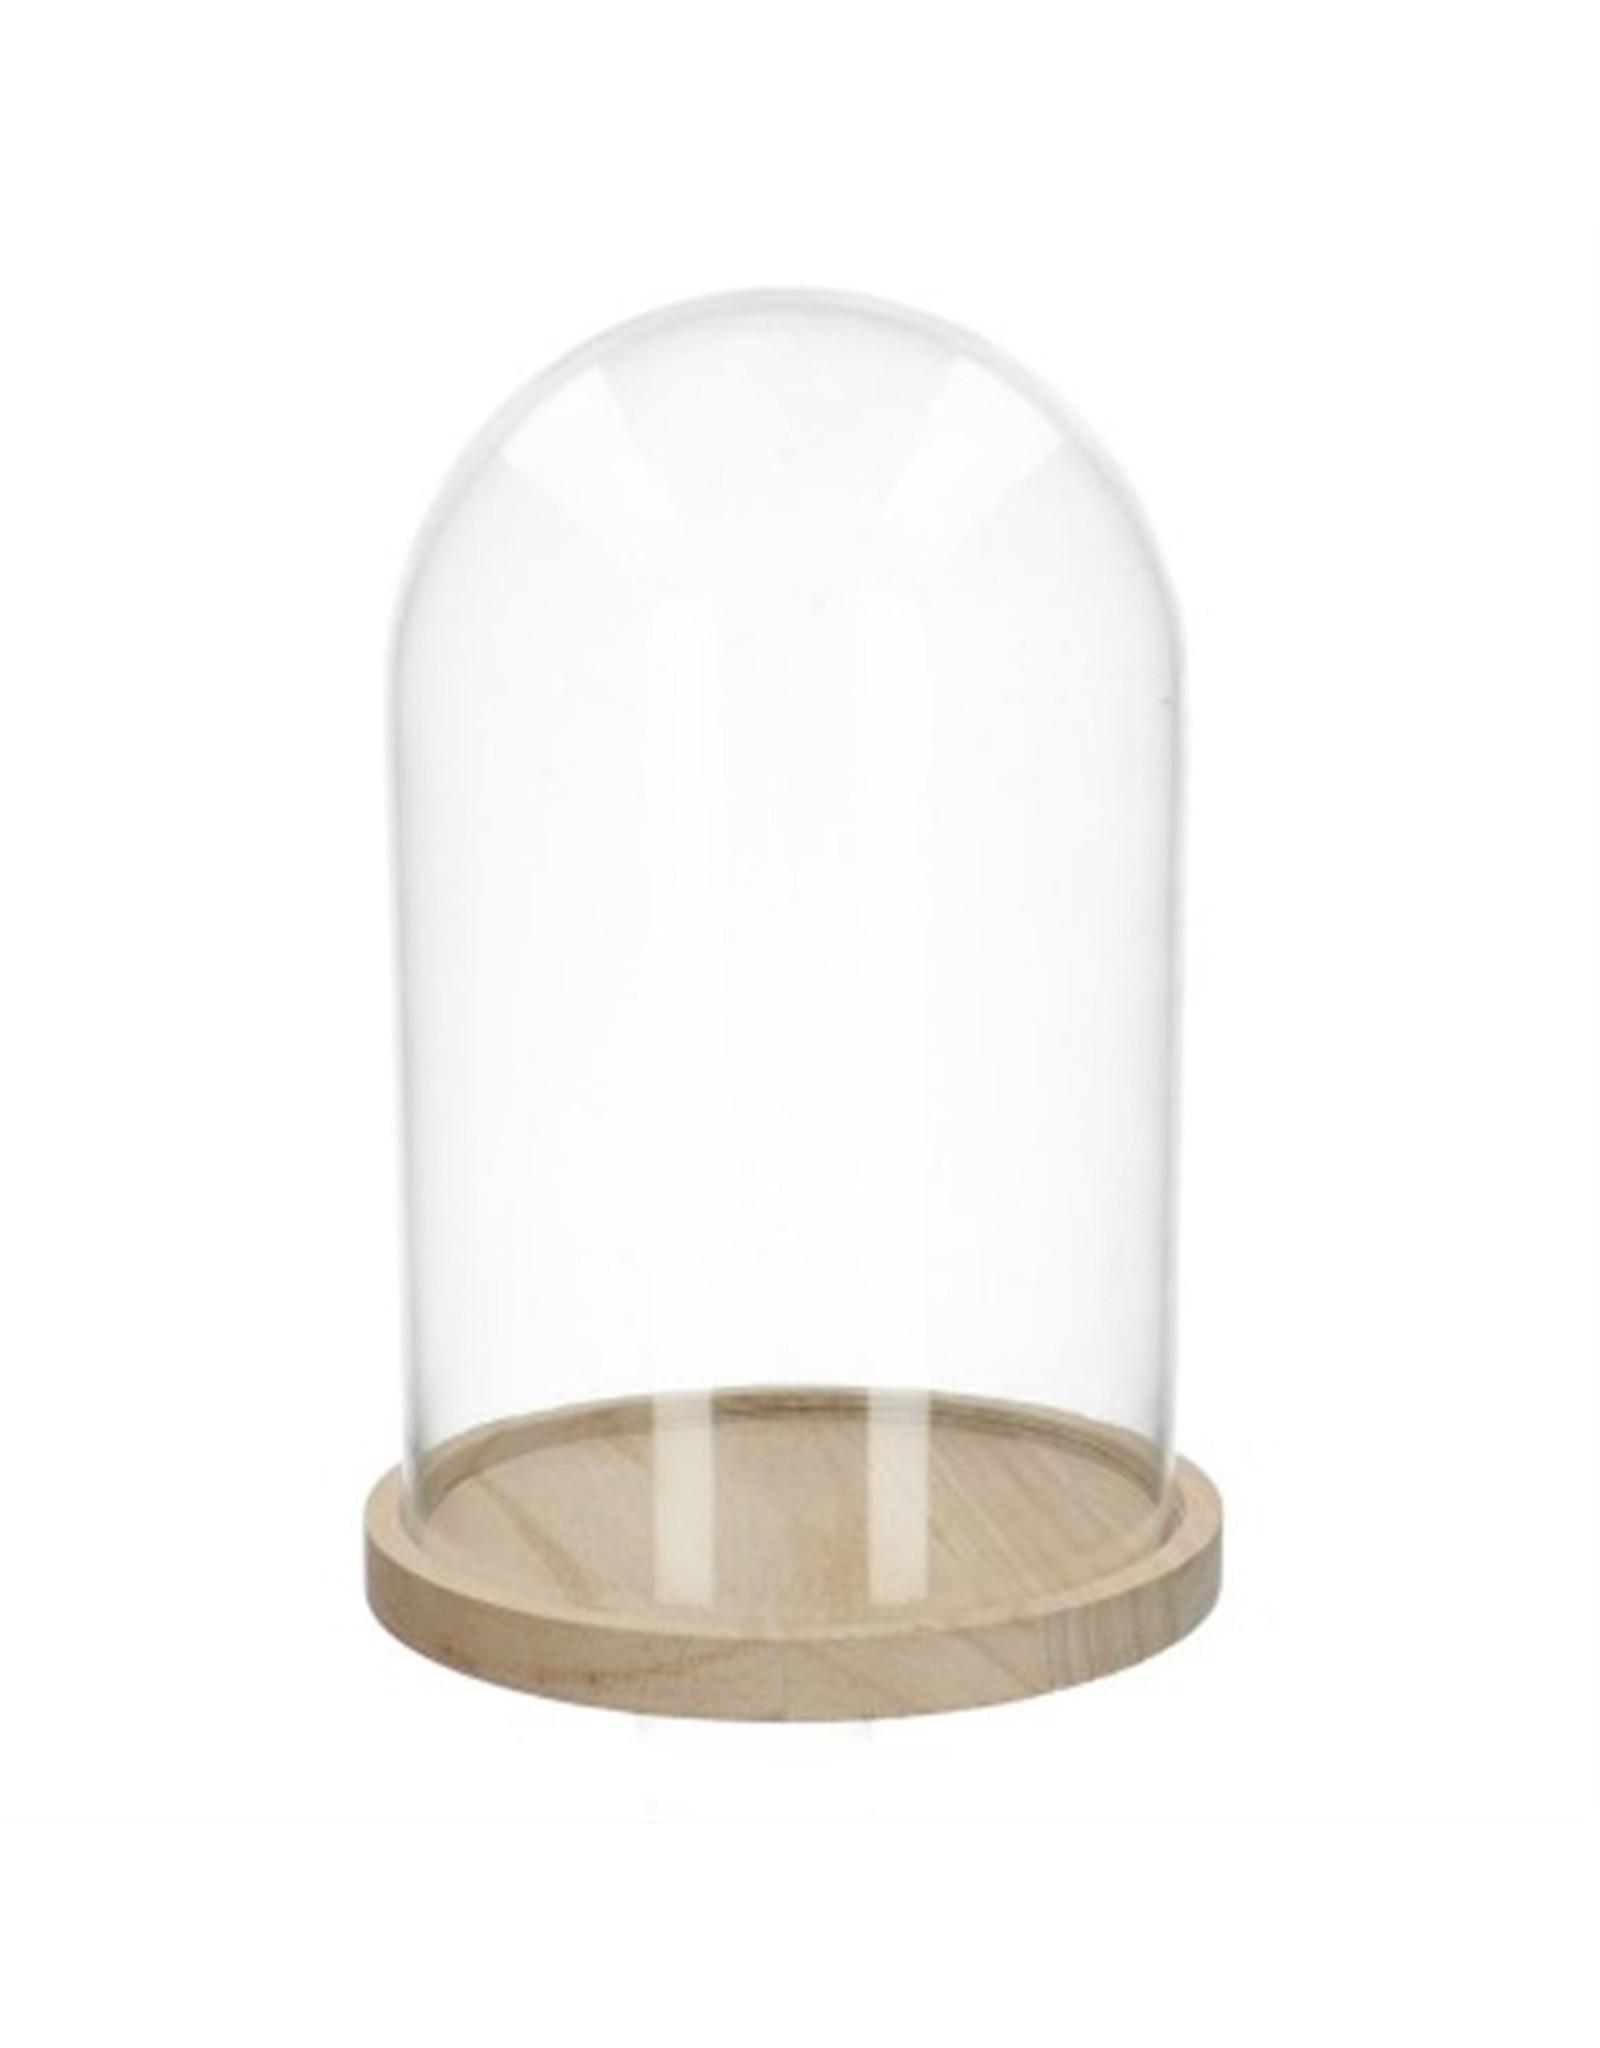 HD Basic Glass Dome W. Wood Base Ø12.0 ↑20.0 (x 12)